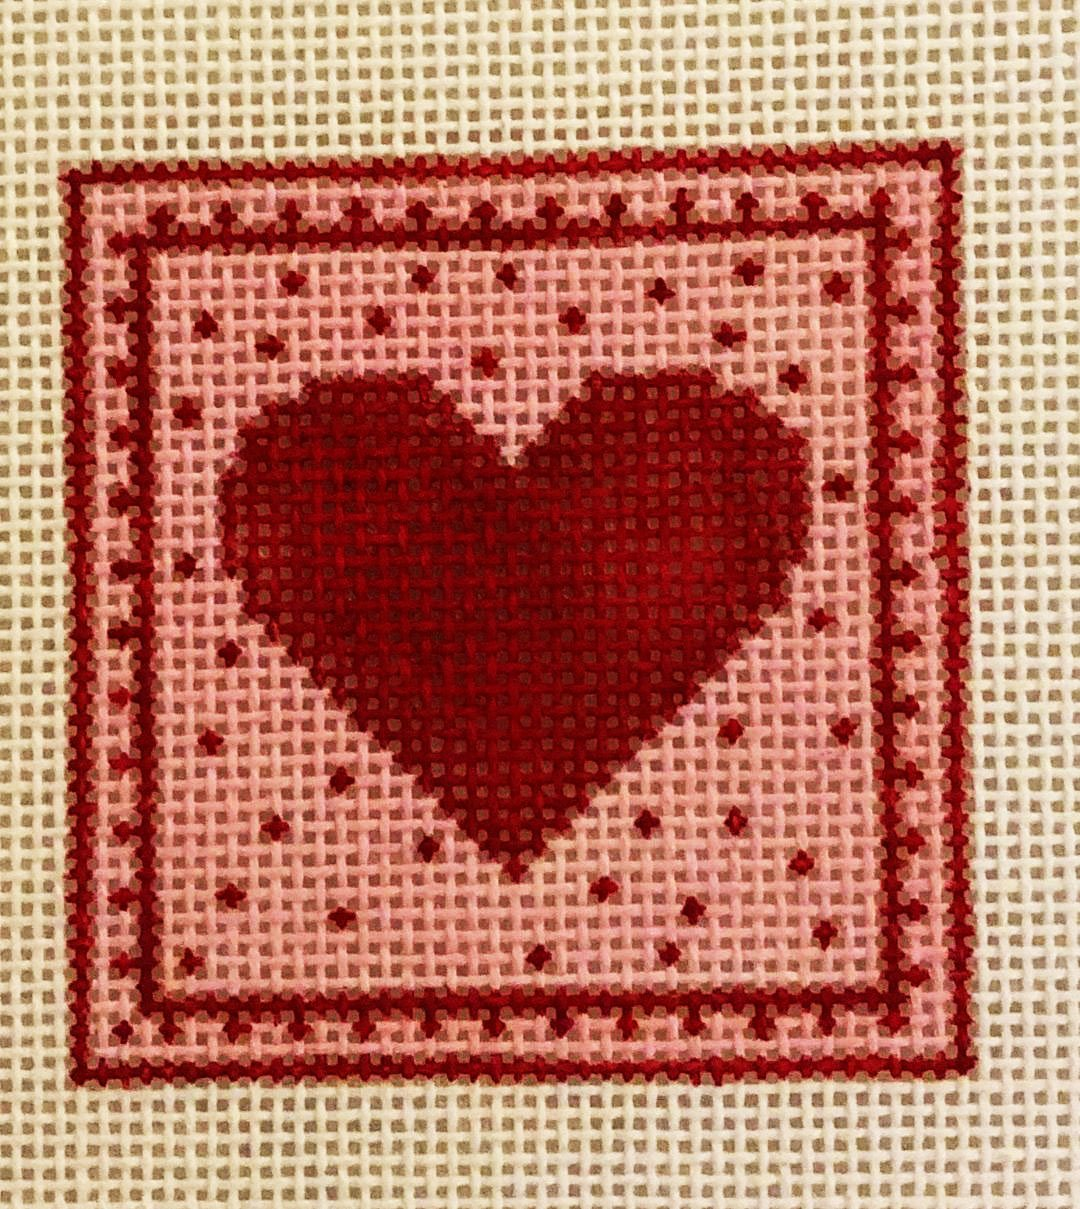 Heart in Square